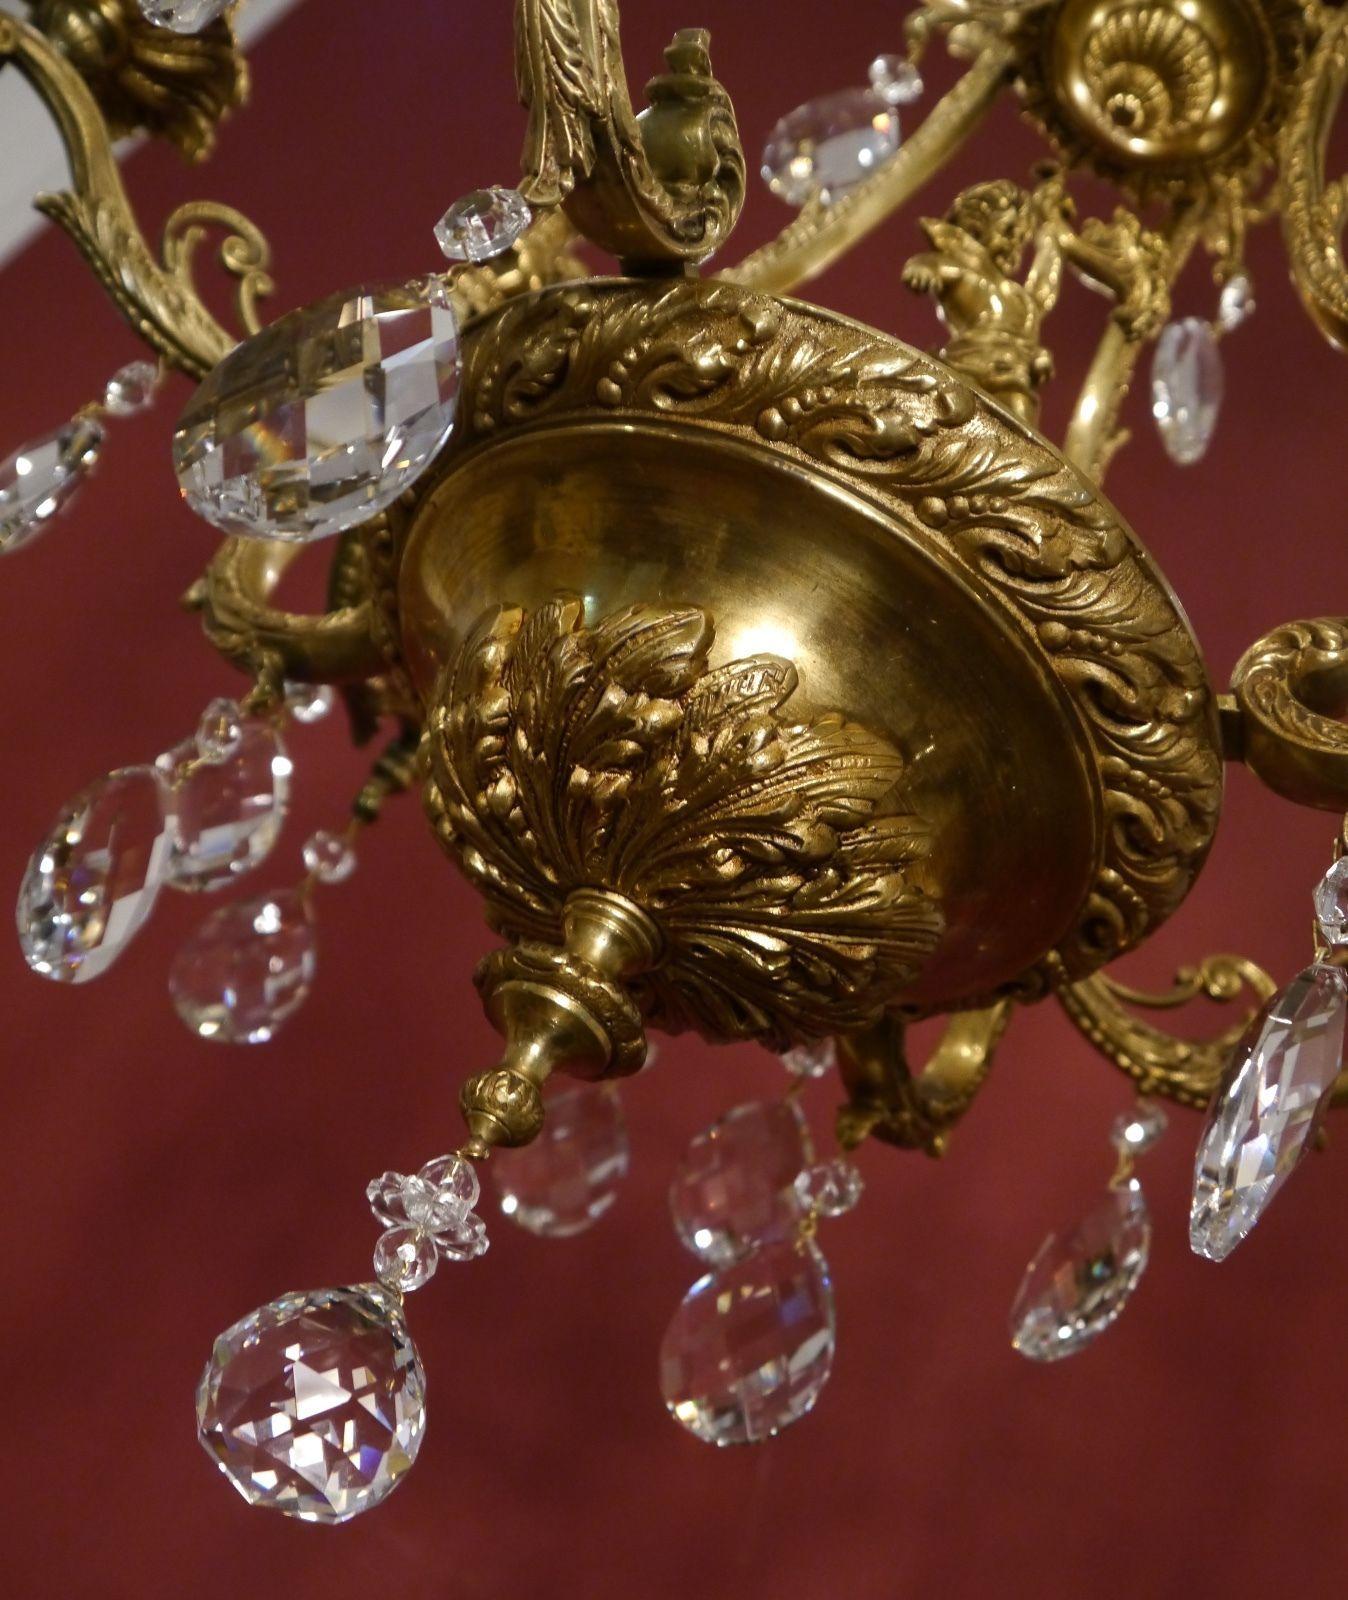 Wow very beautiful cherubs chandelier brass crystal old vintage wow very beautiful cherubs chandelier brass crystal old vintage antique arubaitofo Gallery